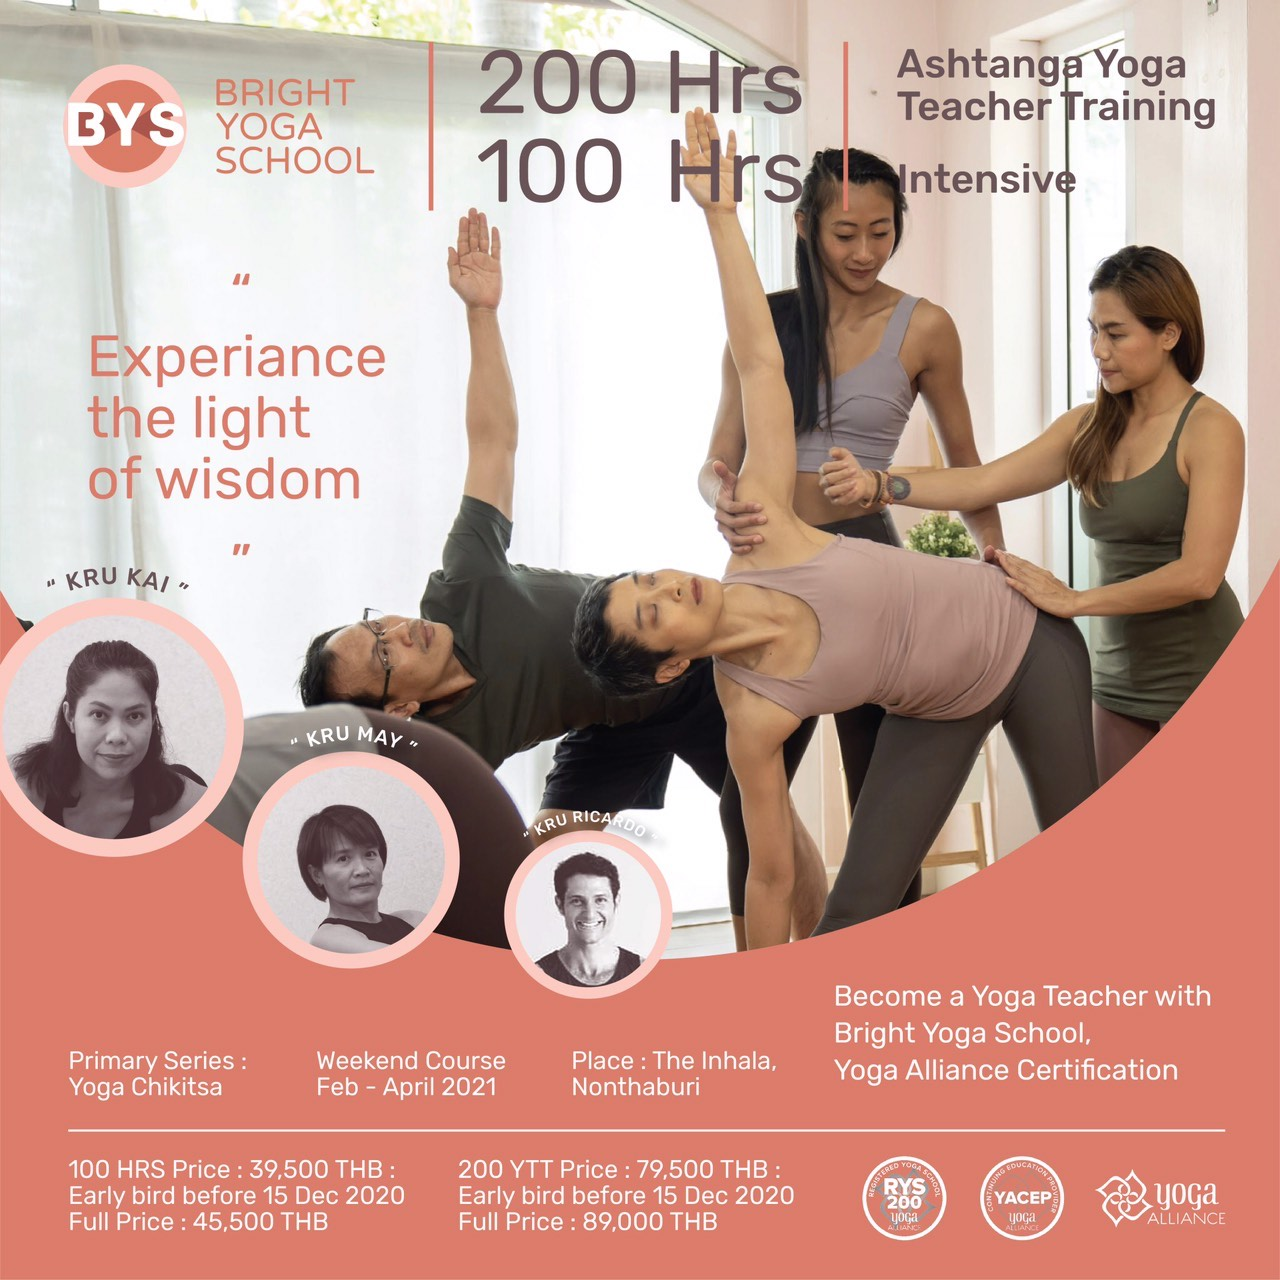 100 Hrs Intensive / 200Hrs Ashtanga Yoga Teacher Training